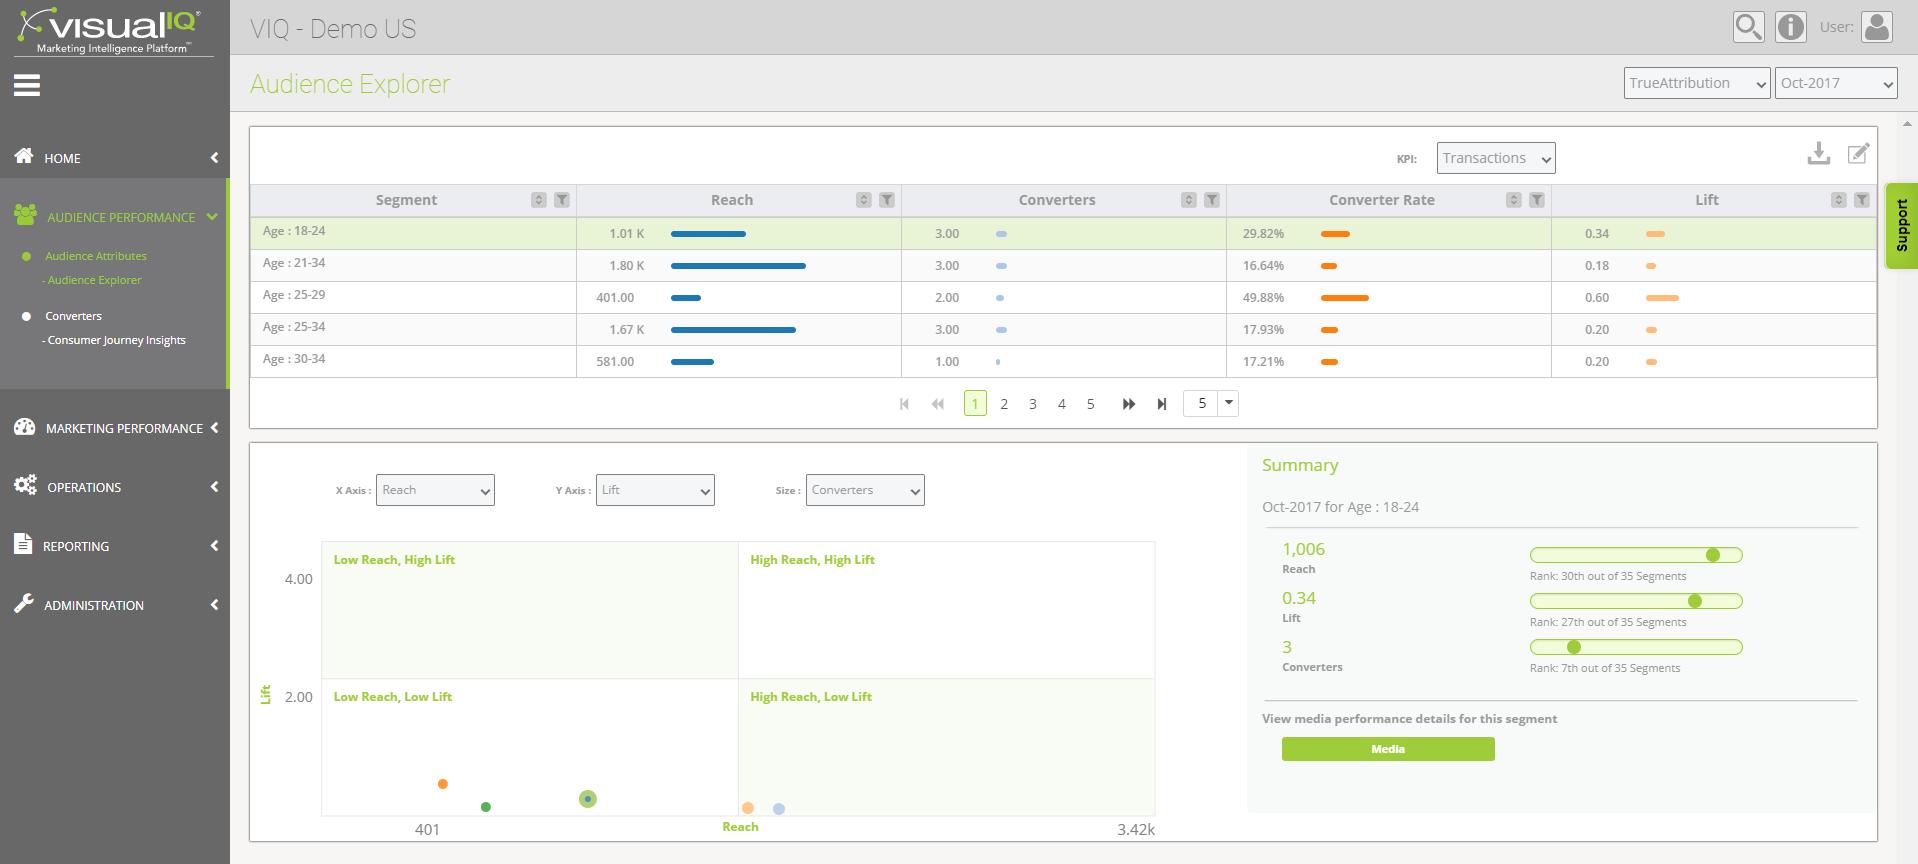 visual IQ Demo - Visual IQ Marketing Intelligence Platform - Audience Explorer